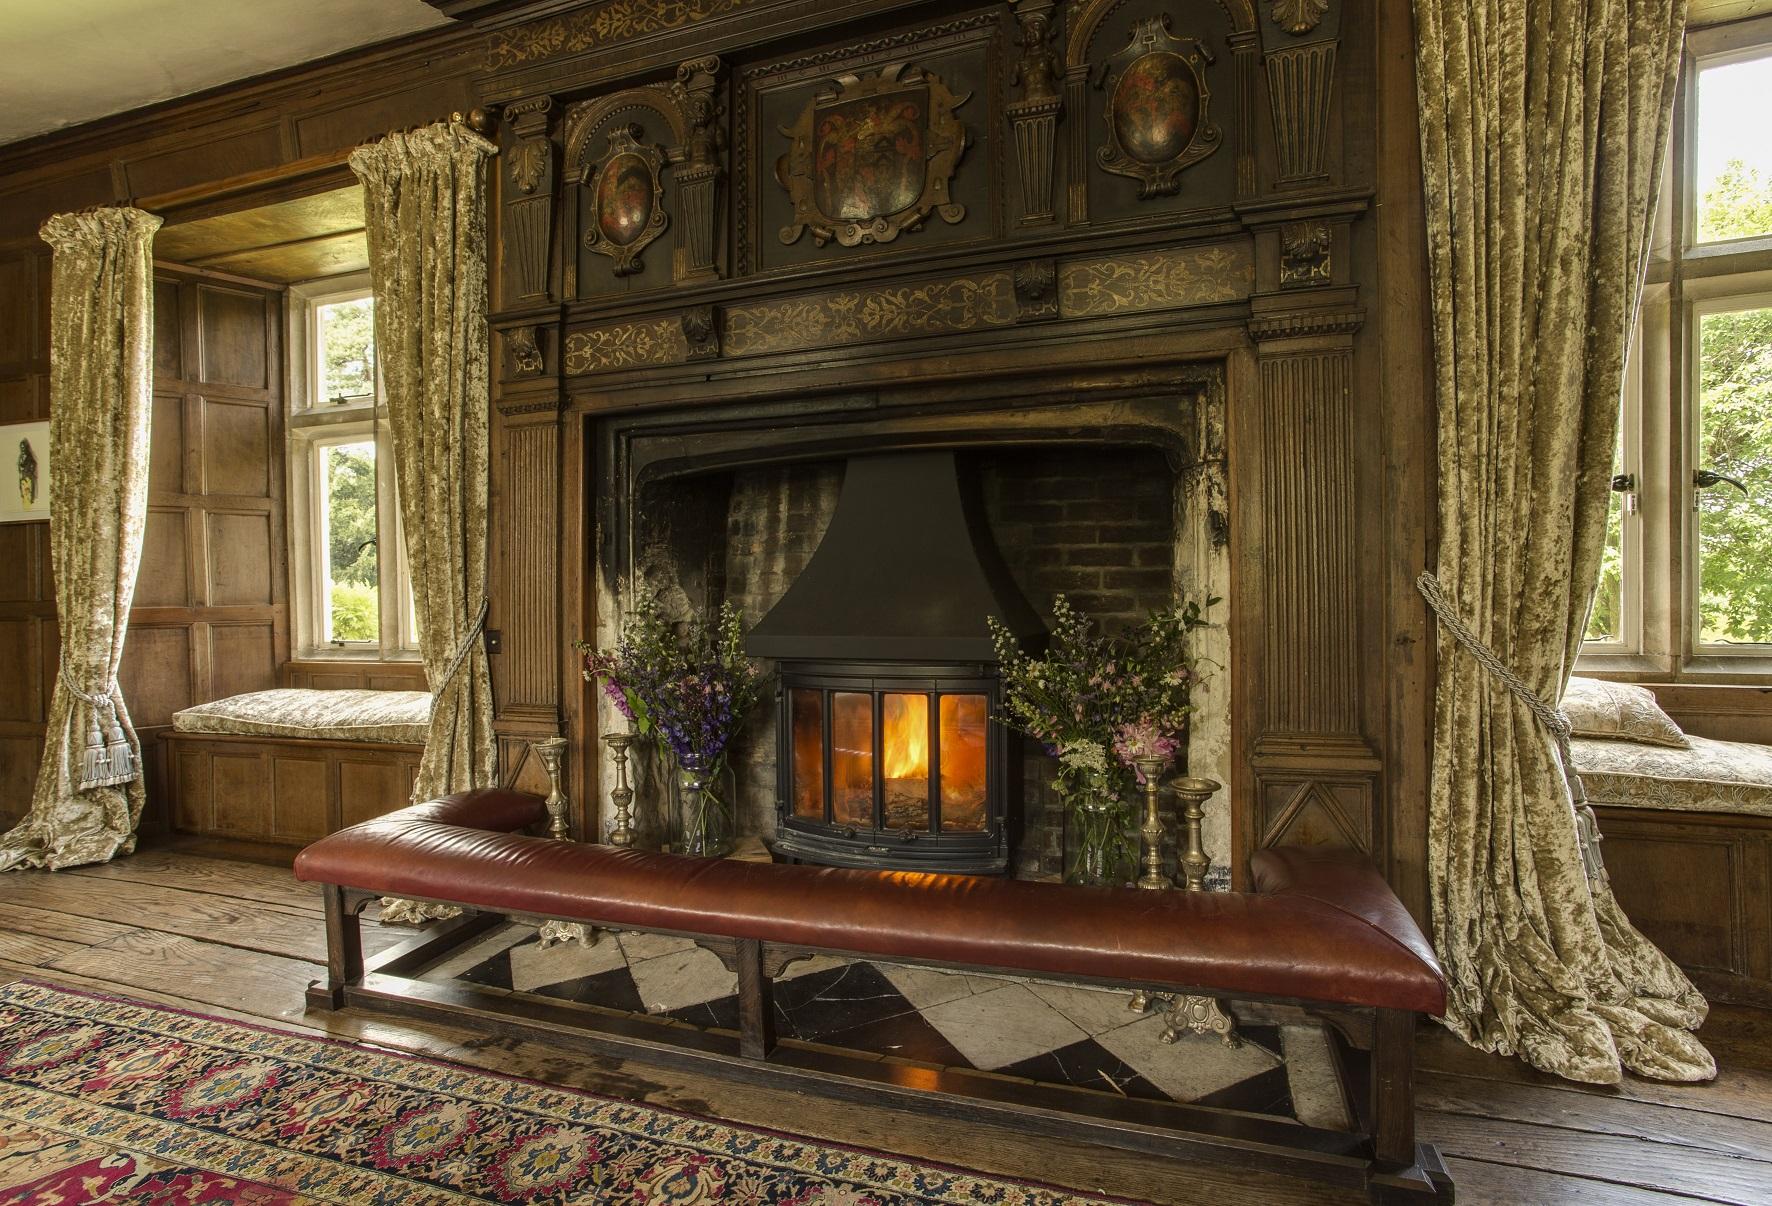 Fireplace resized